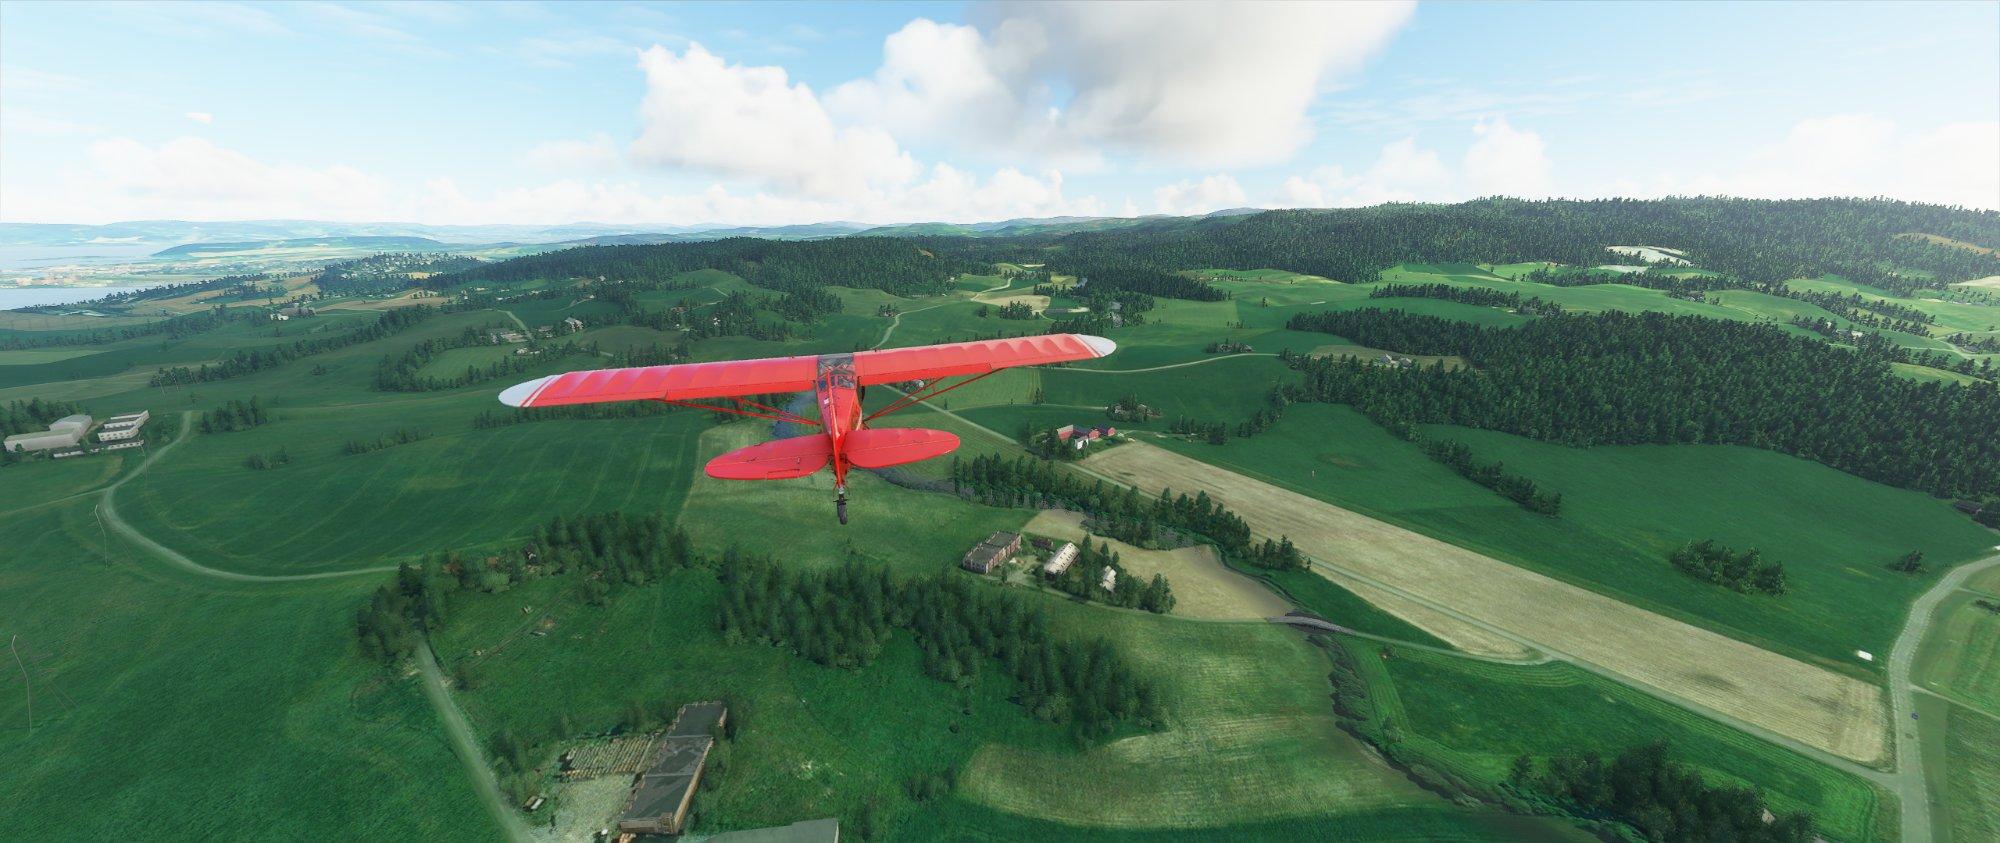 Microsoft Flight Simulator Screenshot 2020.09.24 - 13.48.45.83.jpg